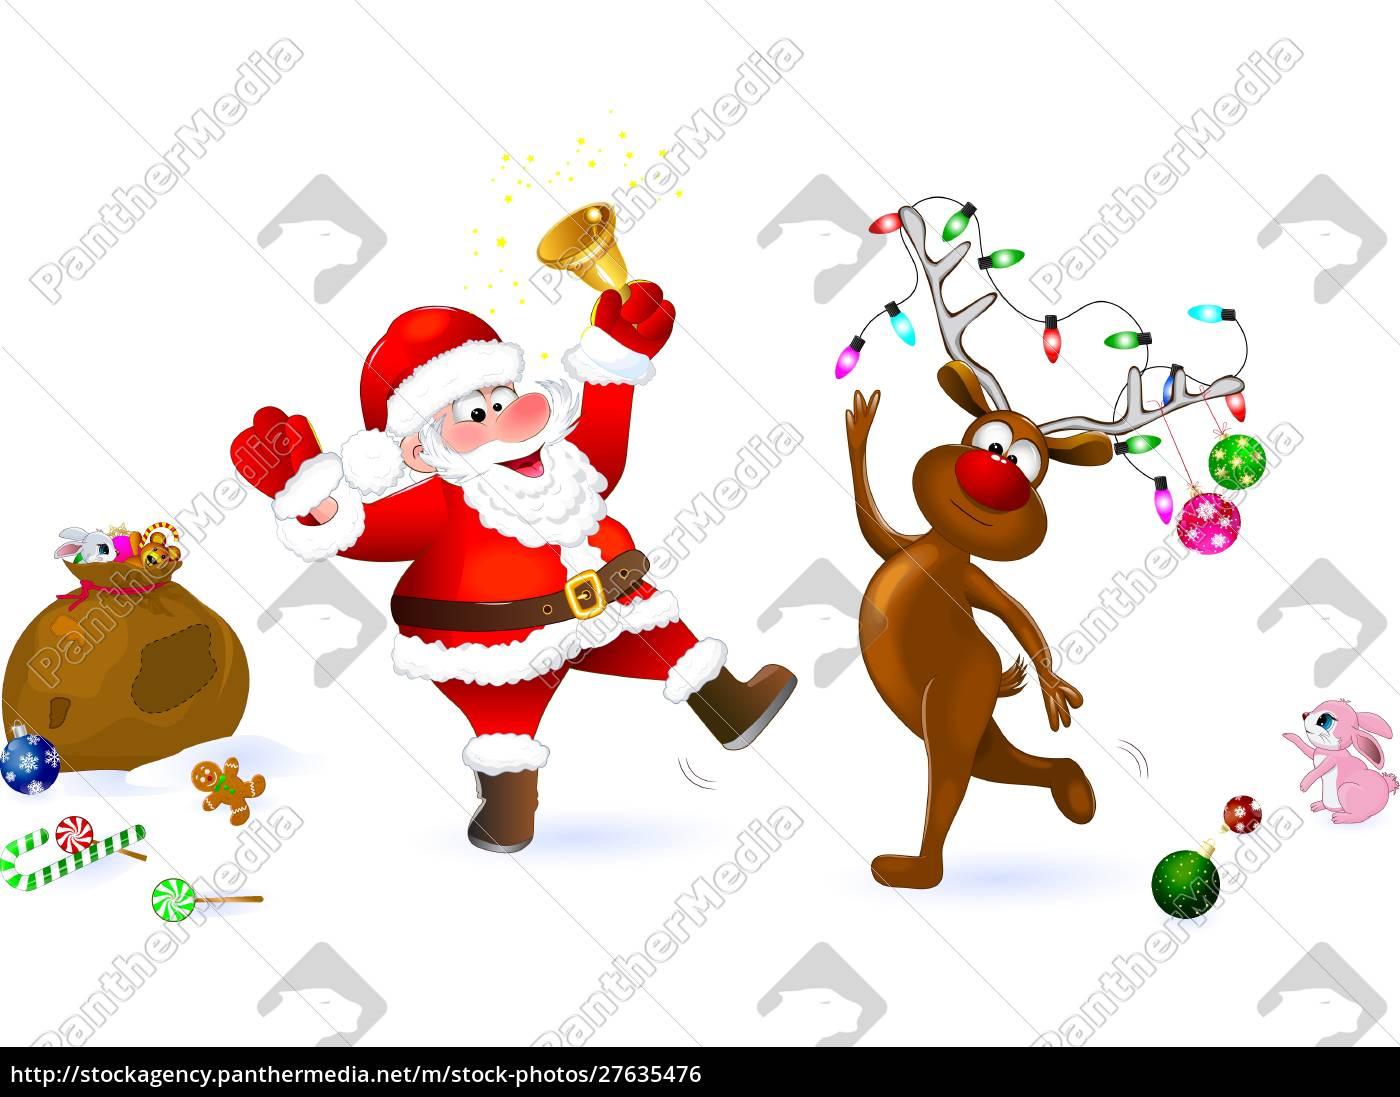 joy, of, christmas, santa, and, deer - 27635476